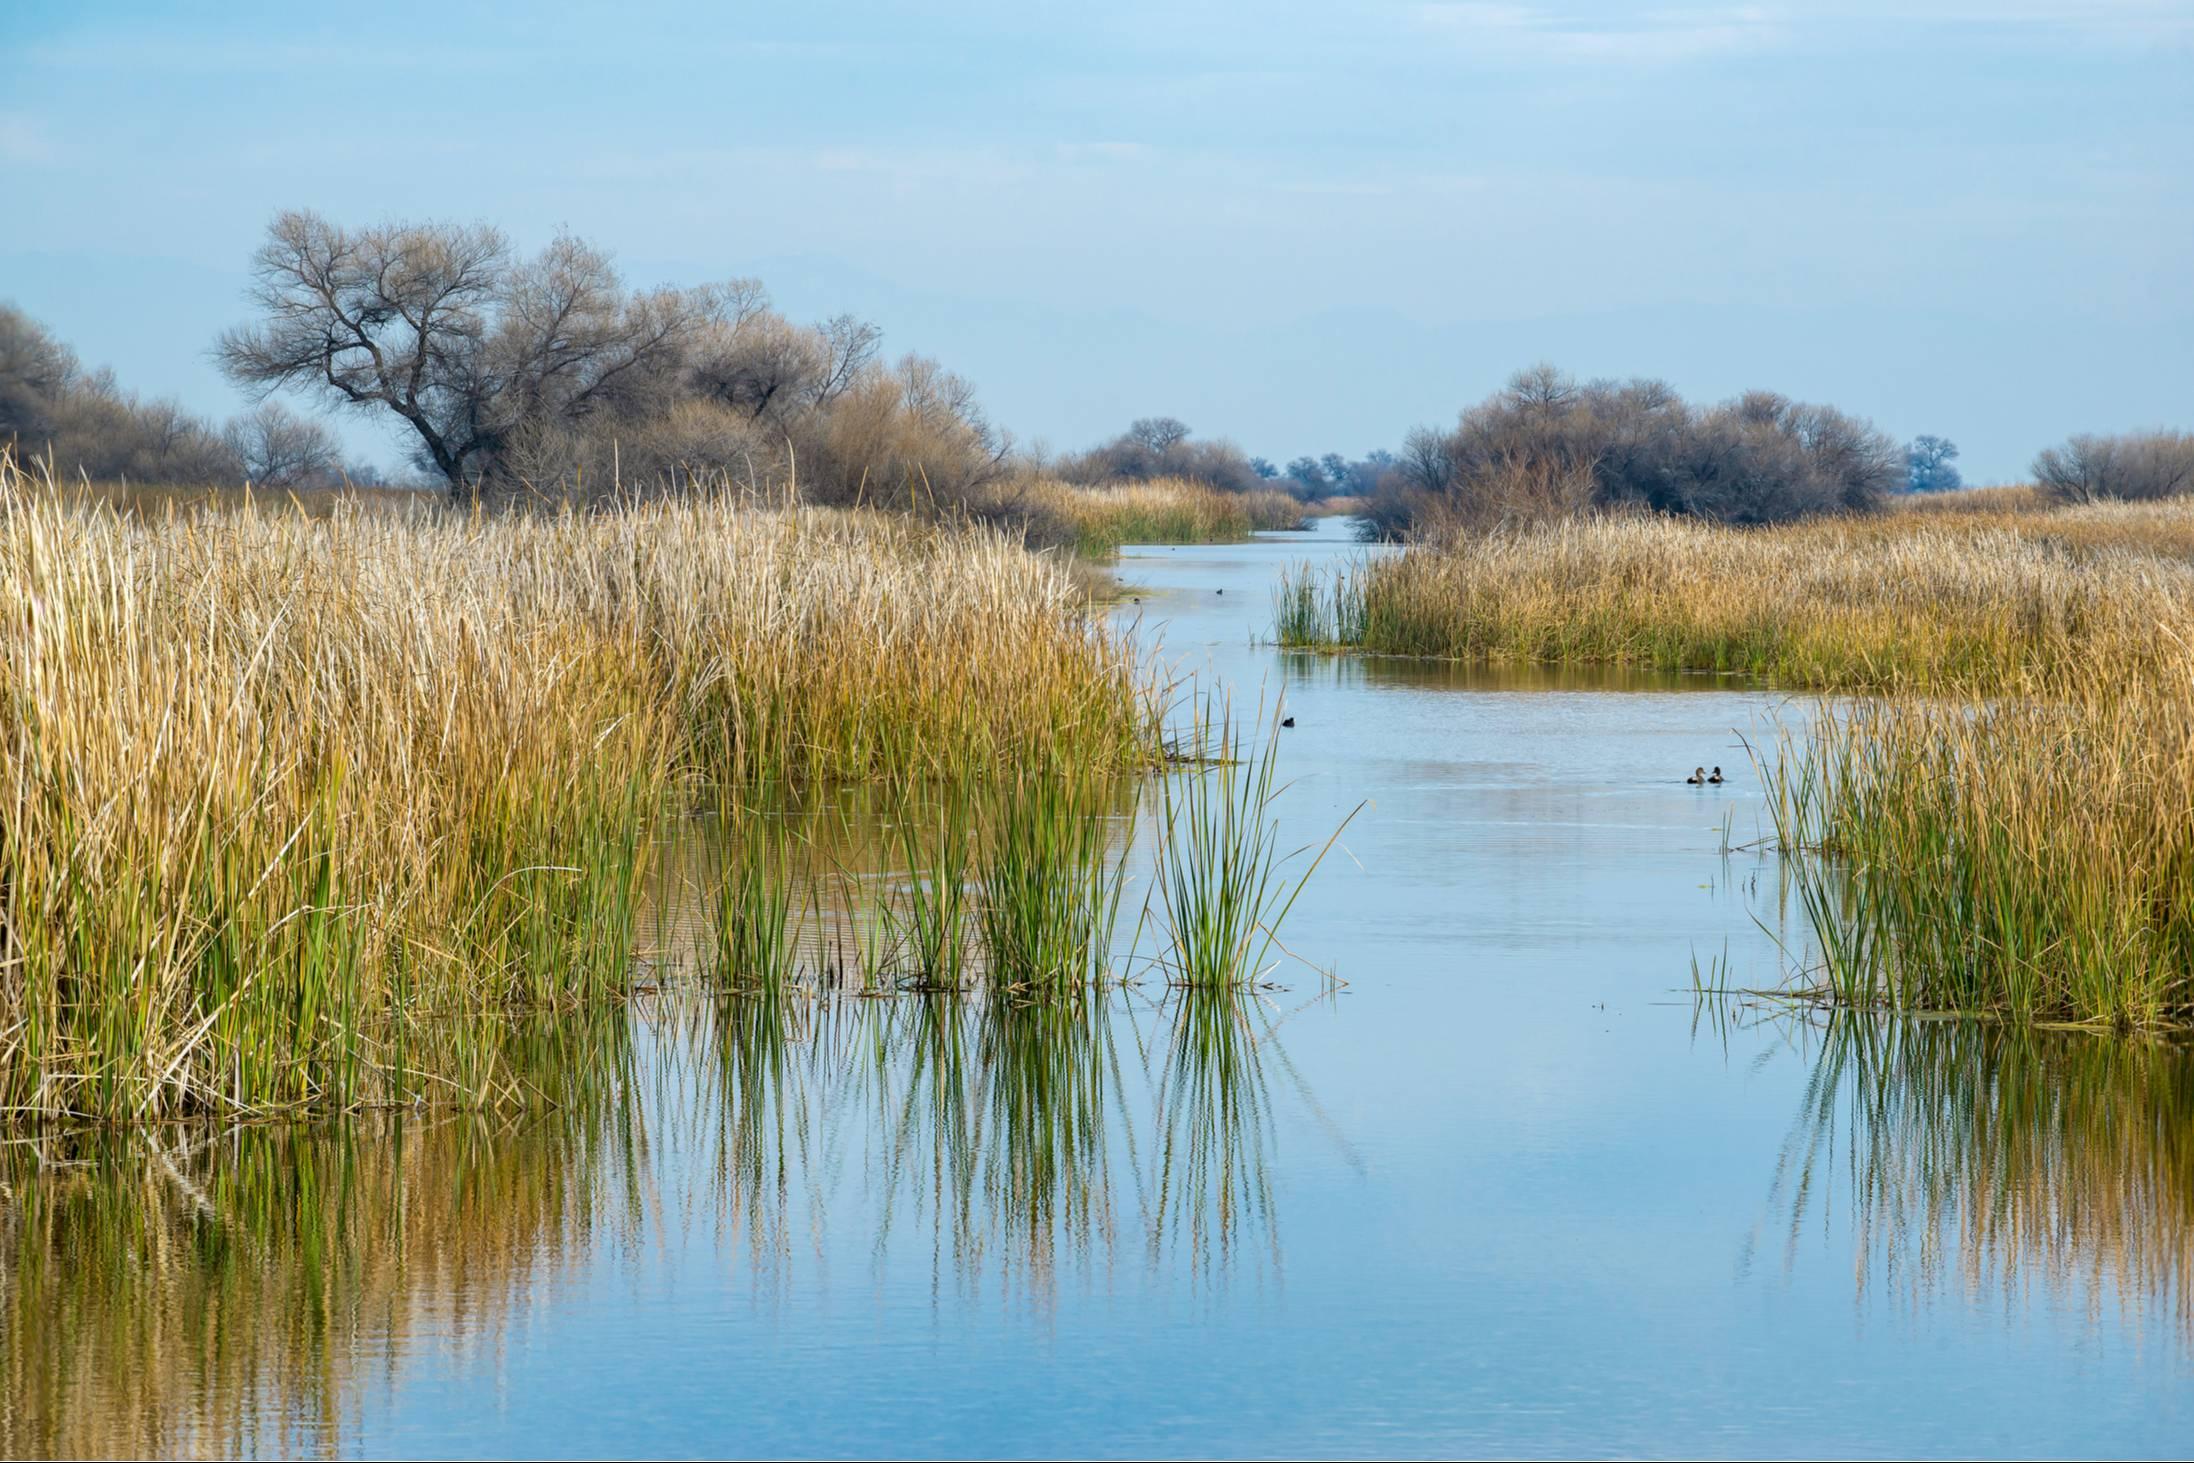 Wildlife refuge near the San Joaquins, CA, USA.